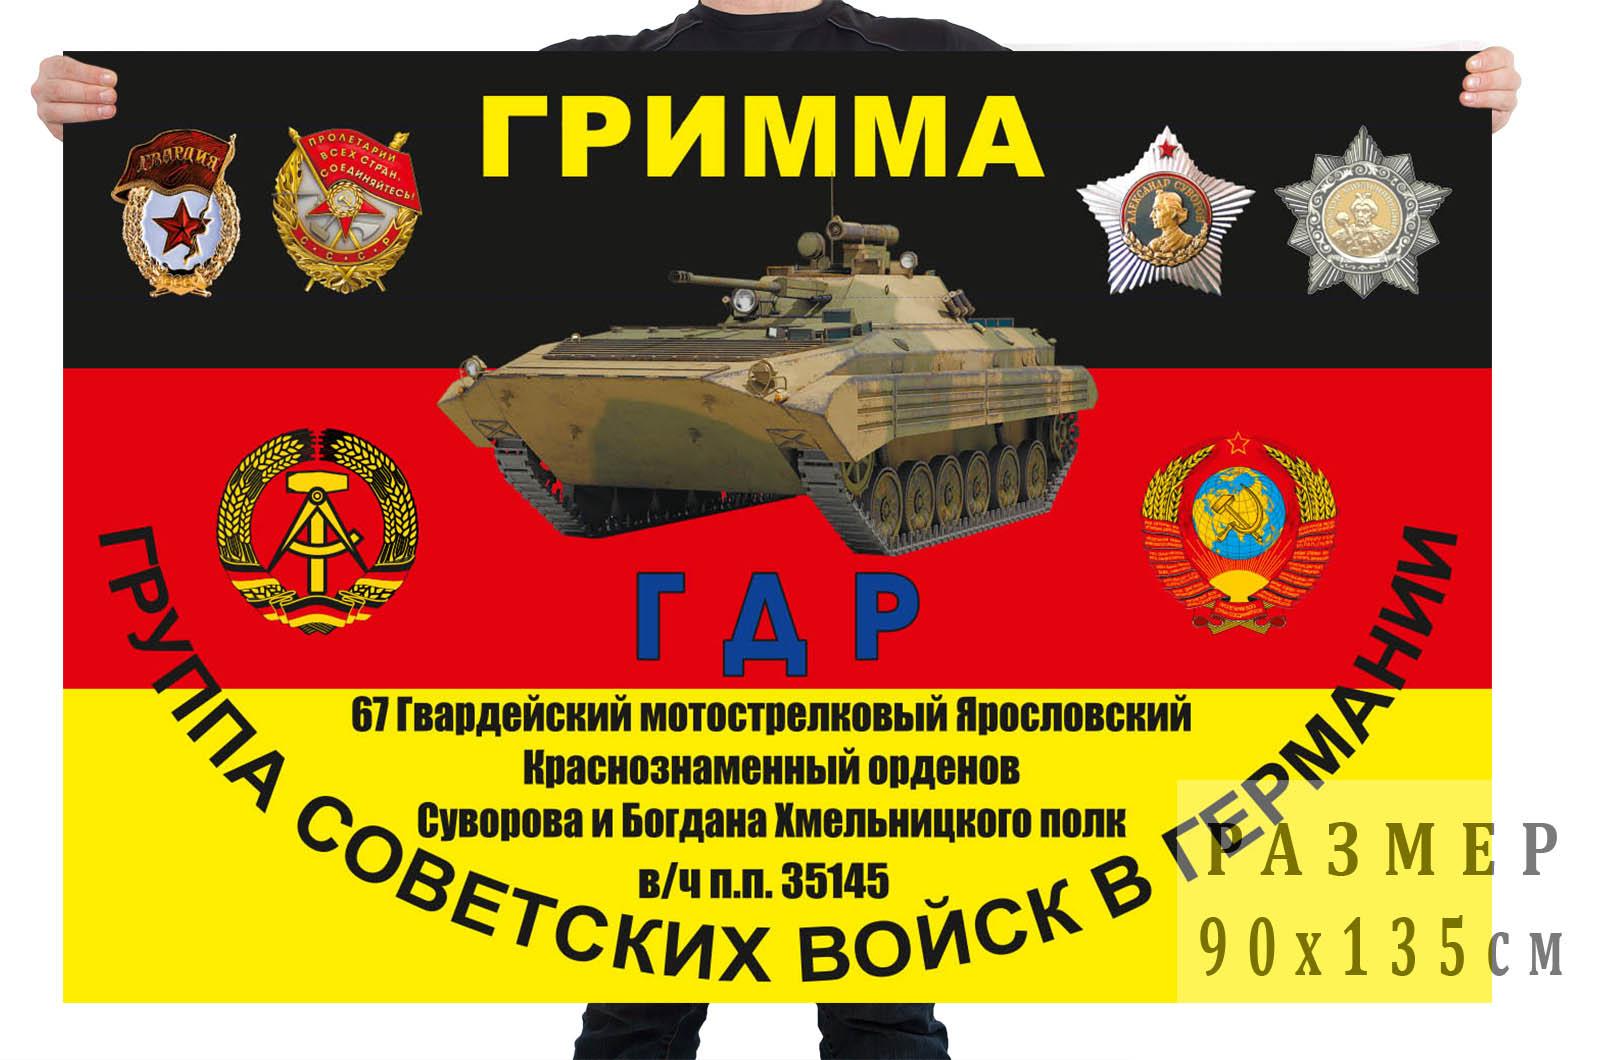 Флаг 67 гвардейского мотострелкового полка